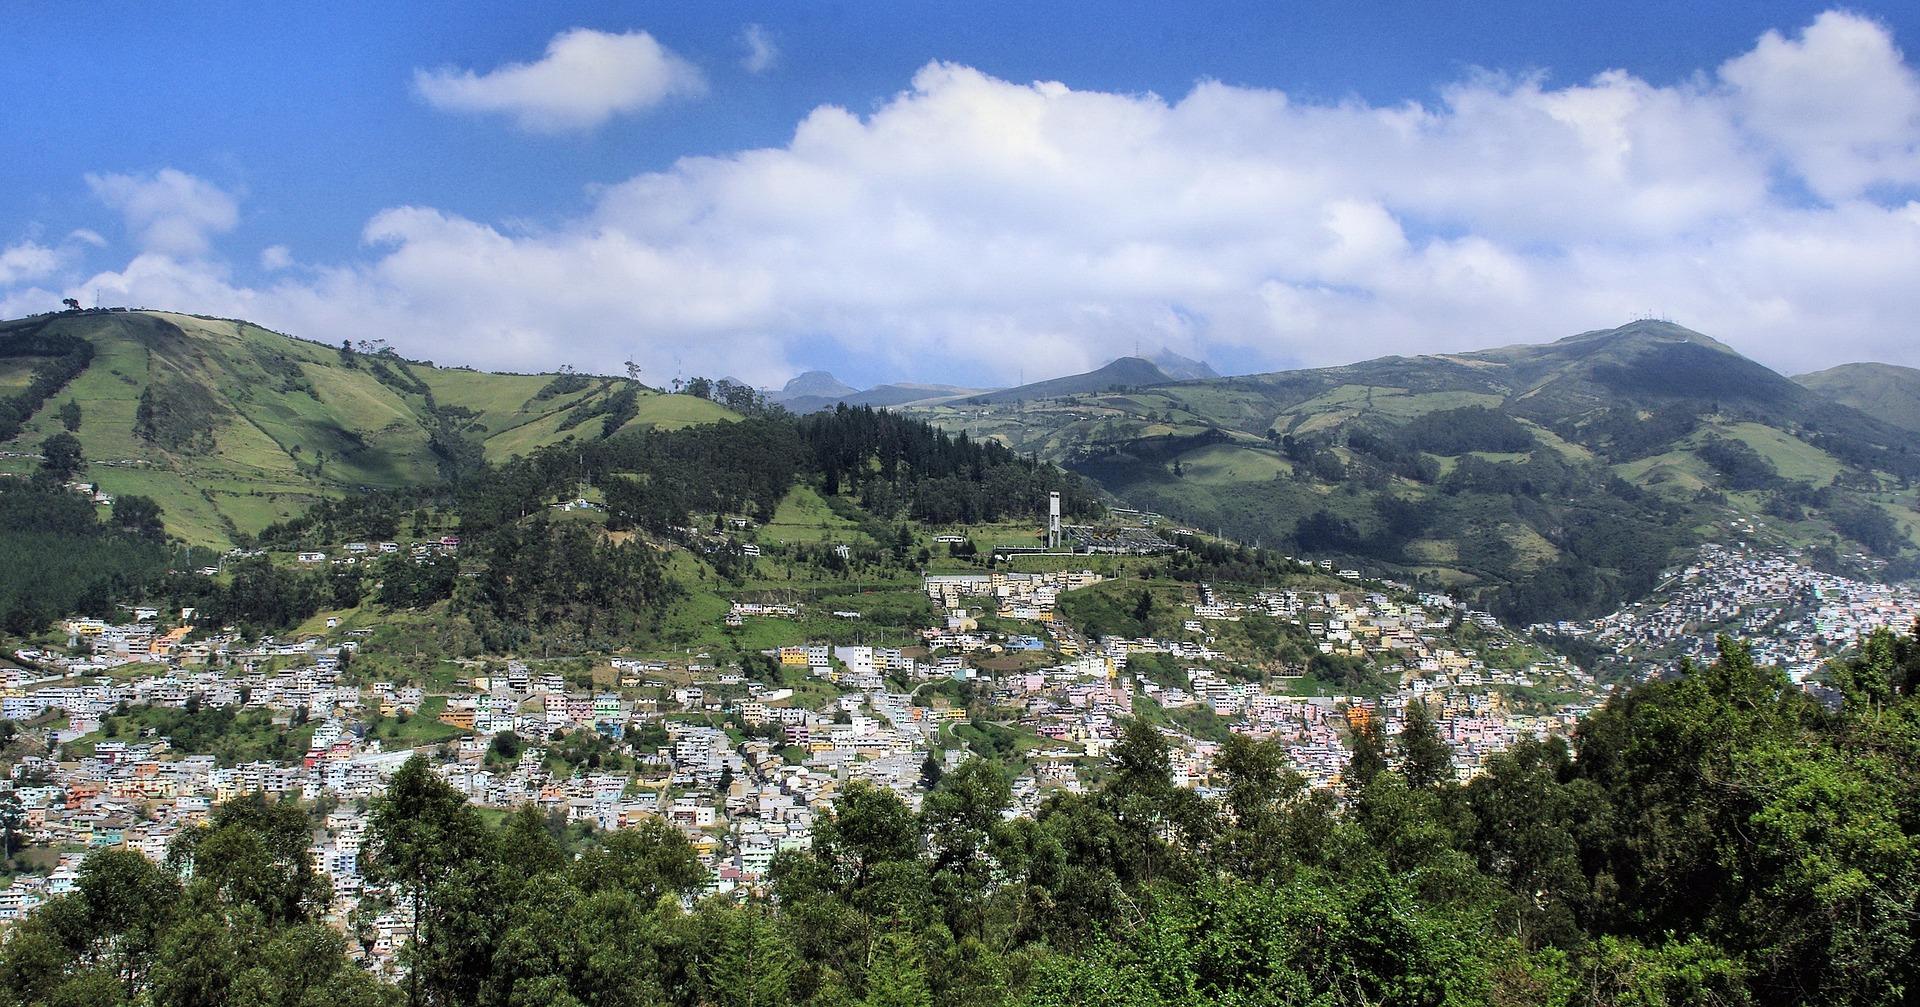 Vue des environs de Quito